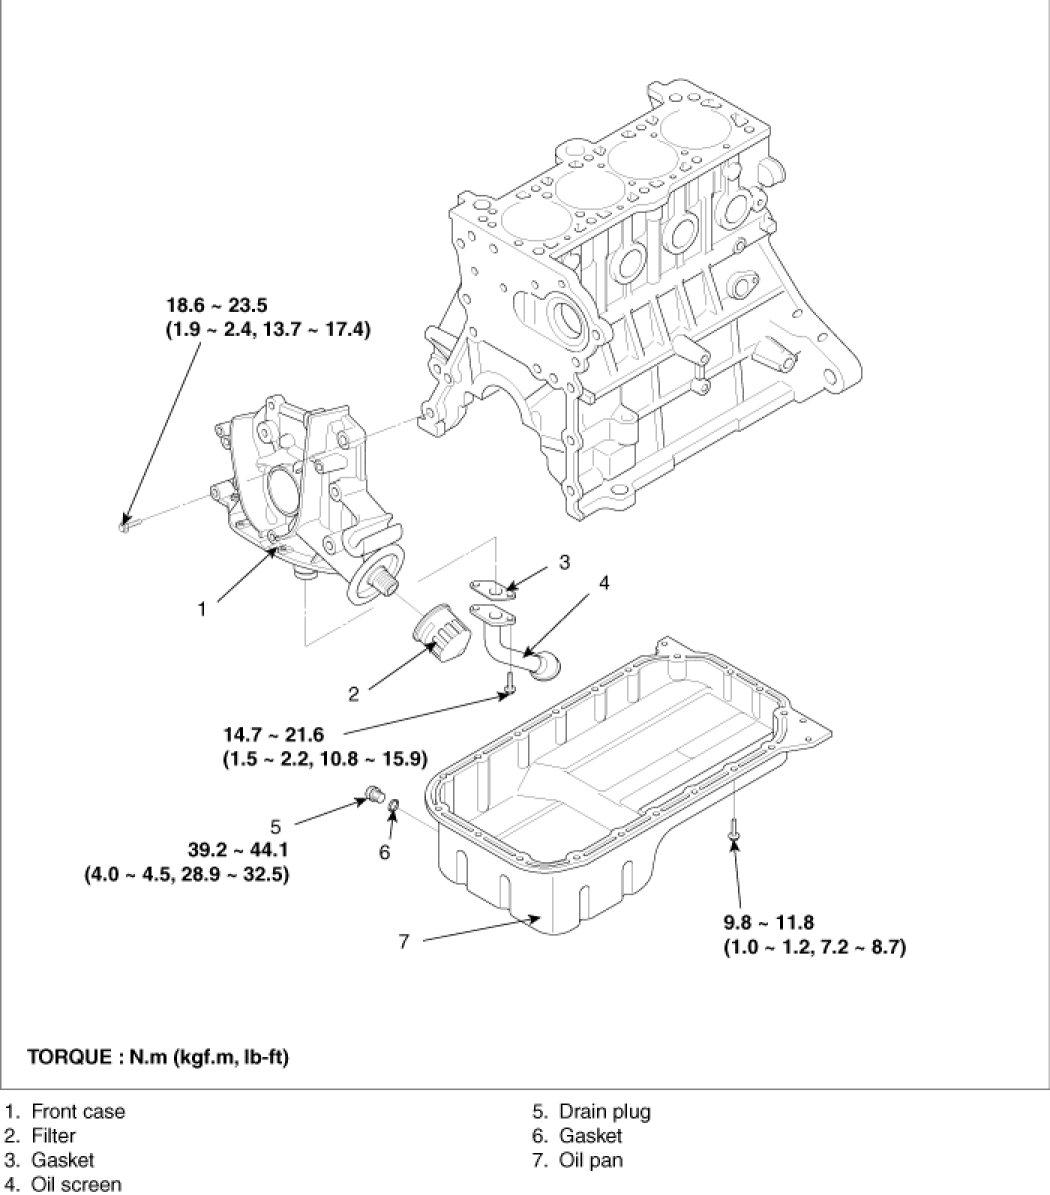 how do i do an oil change on a 2009 kia rio5 Hyundai Elantra graphic